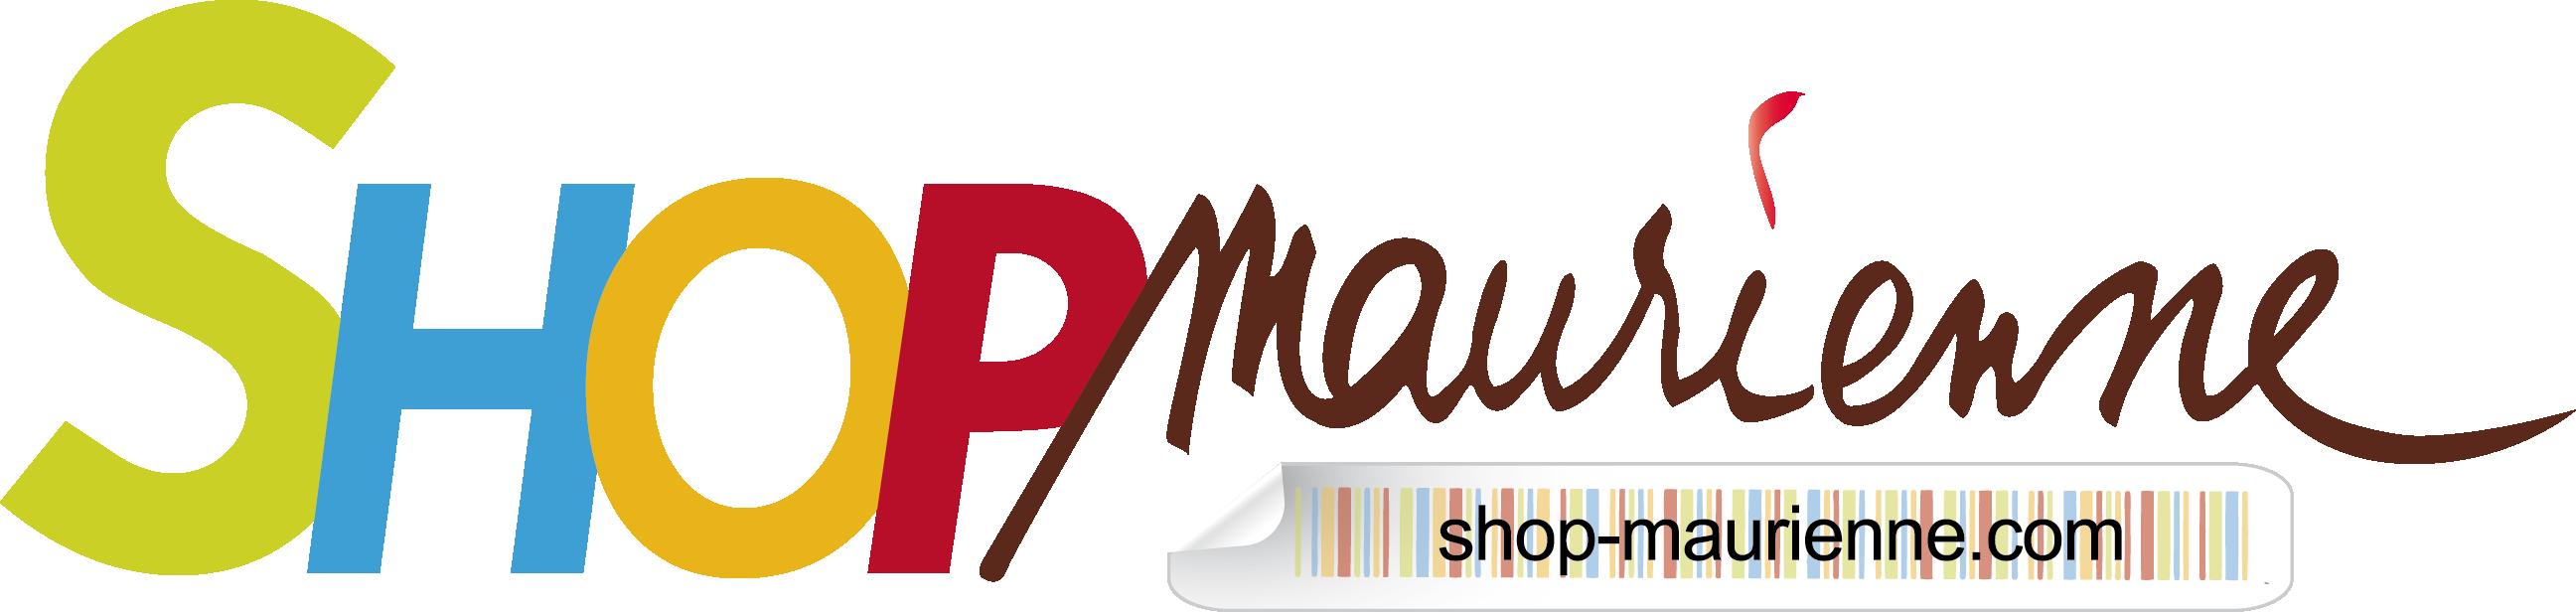 logo SHOP MAURIENNE